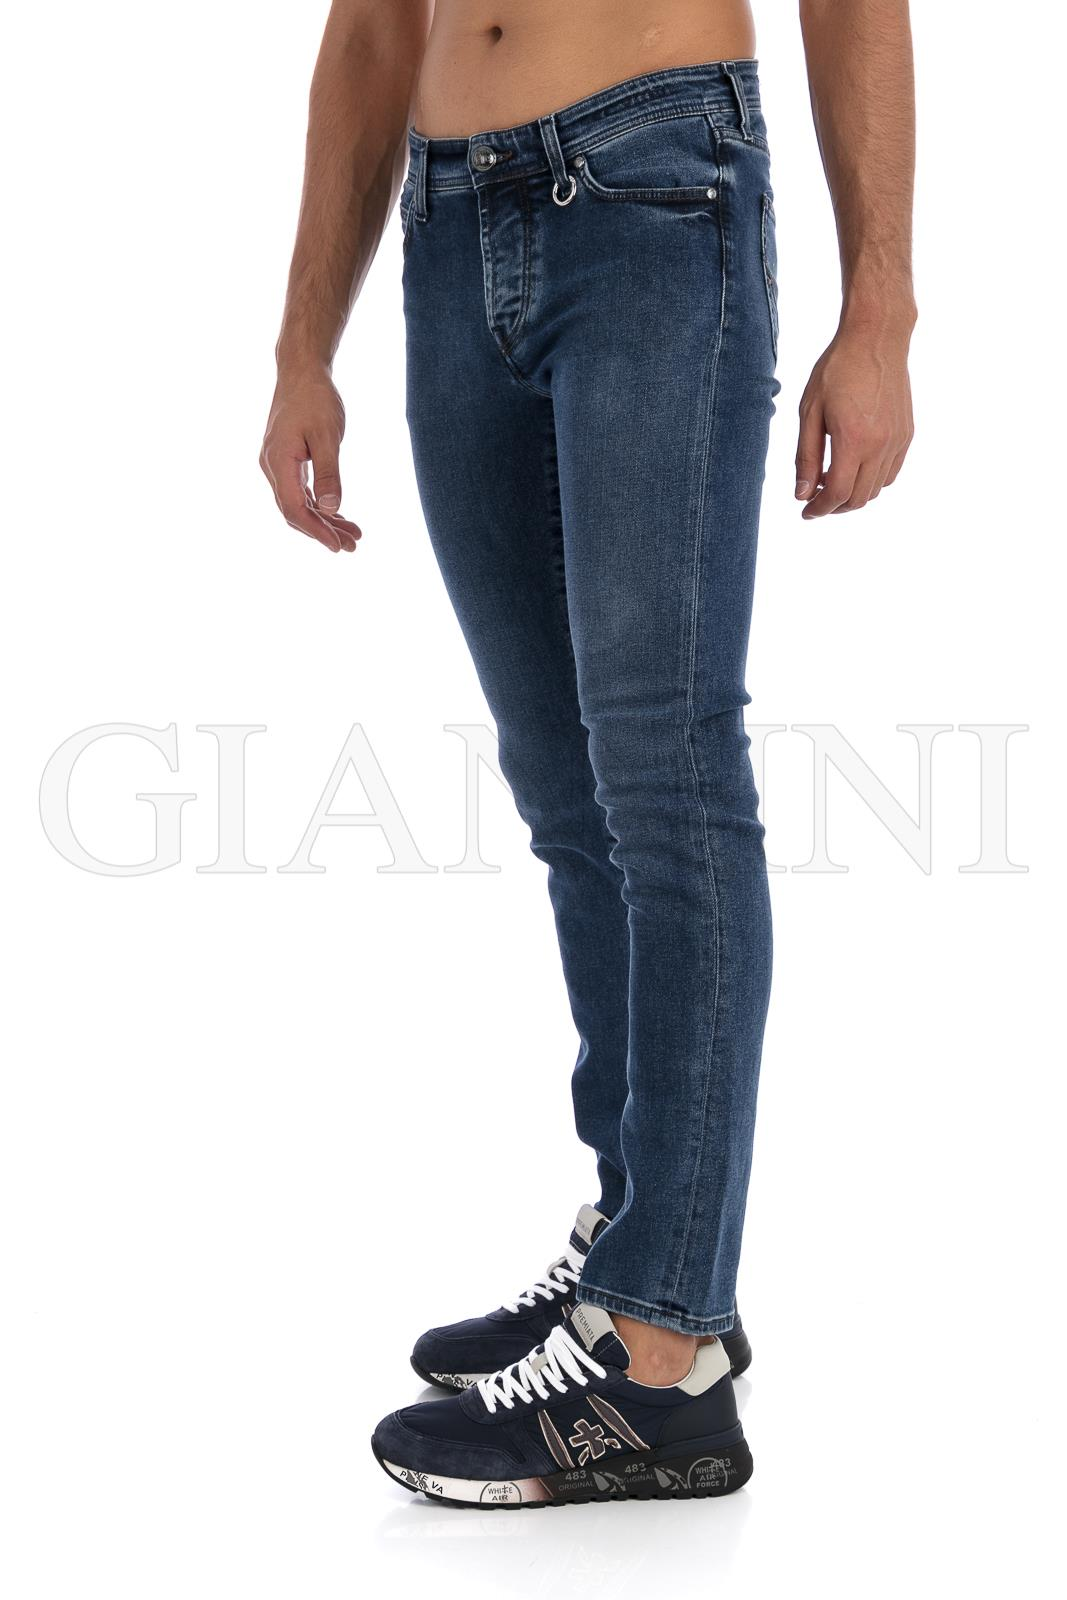 Roy Rogers Jeans 529 rr's berty   Giannini Shop Online